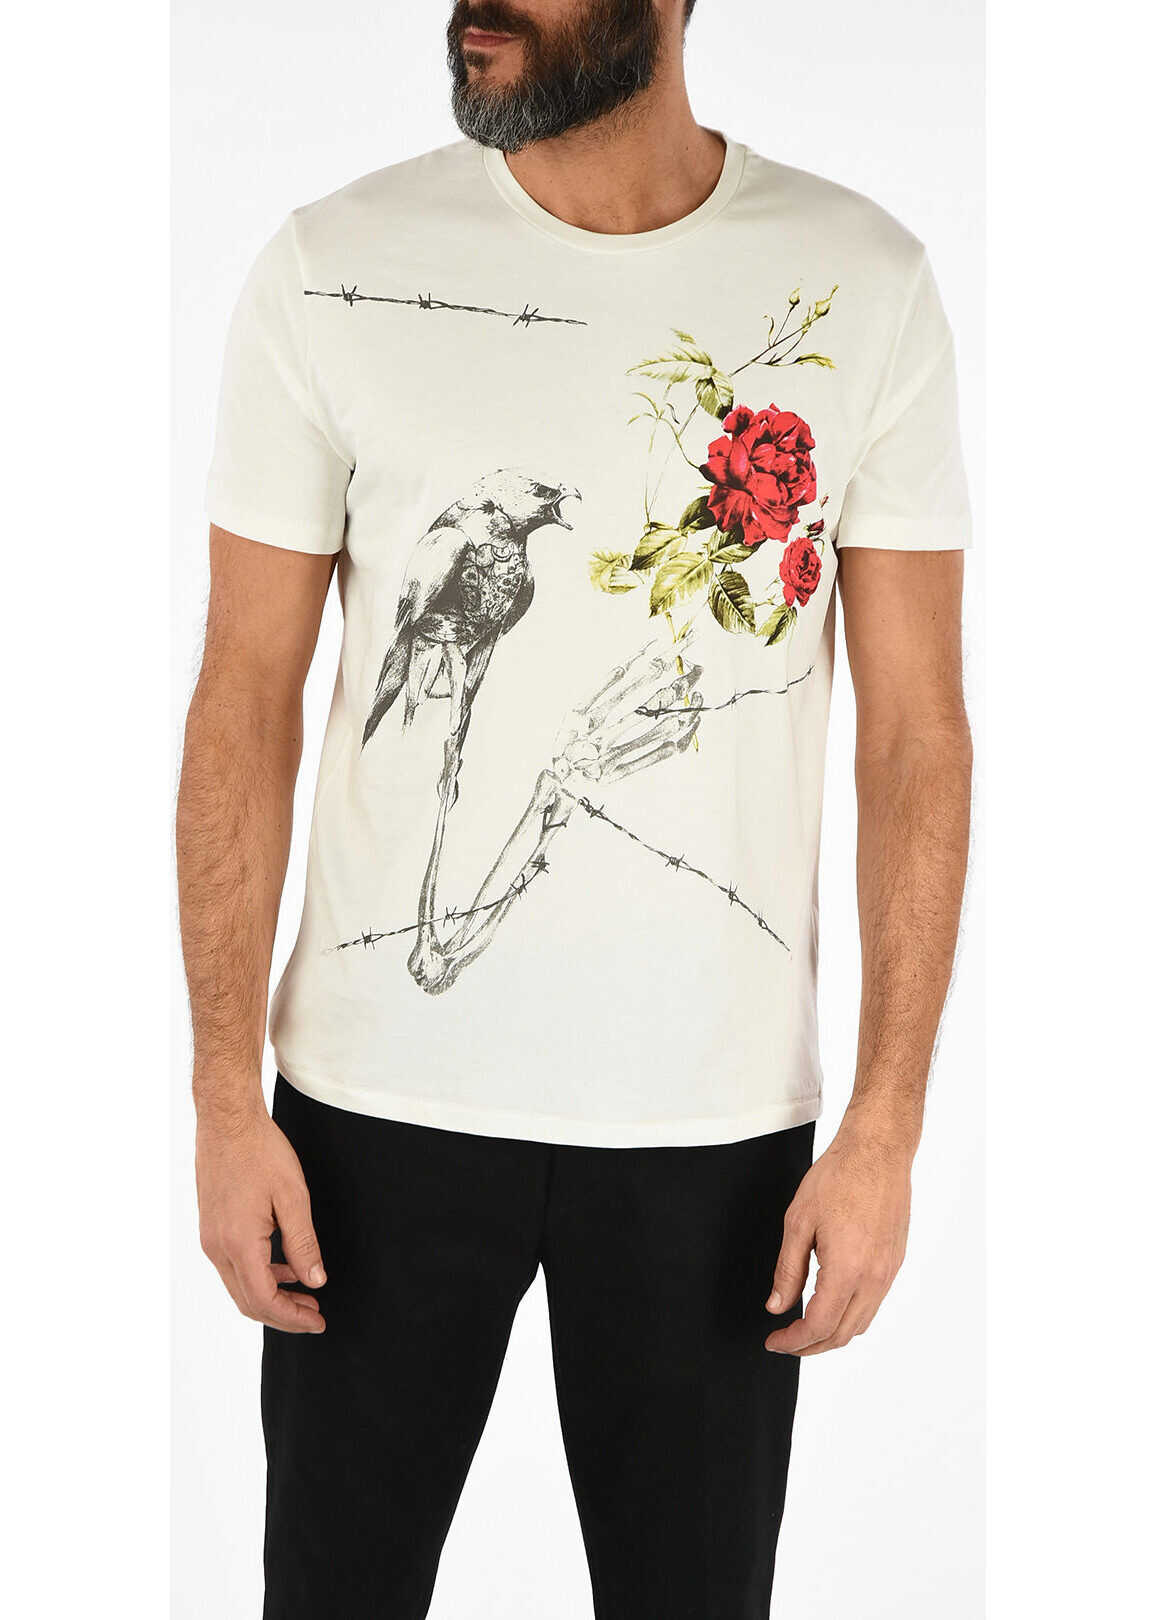 Just Cavalli Round Neck T-shirt WHITE